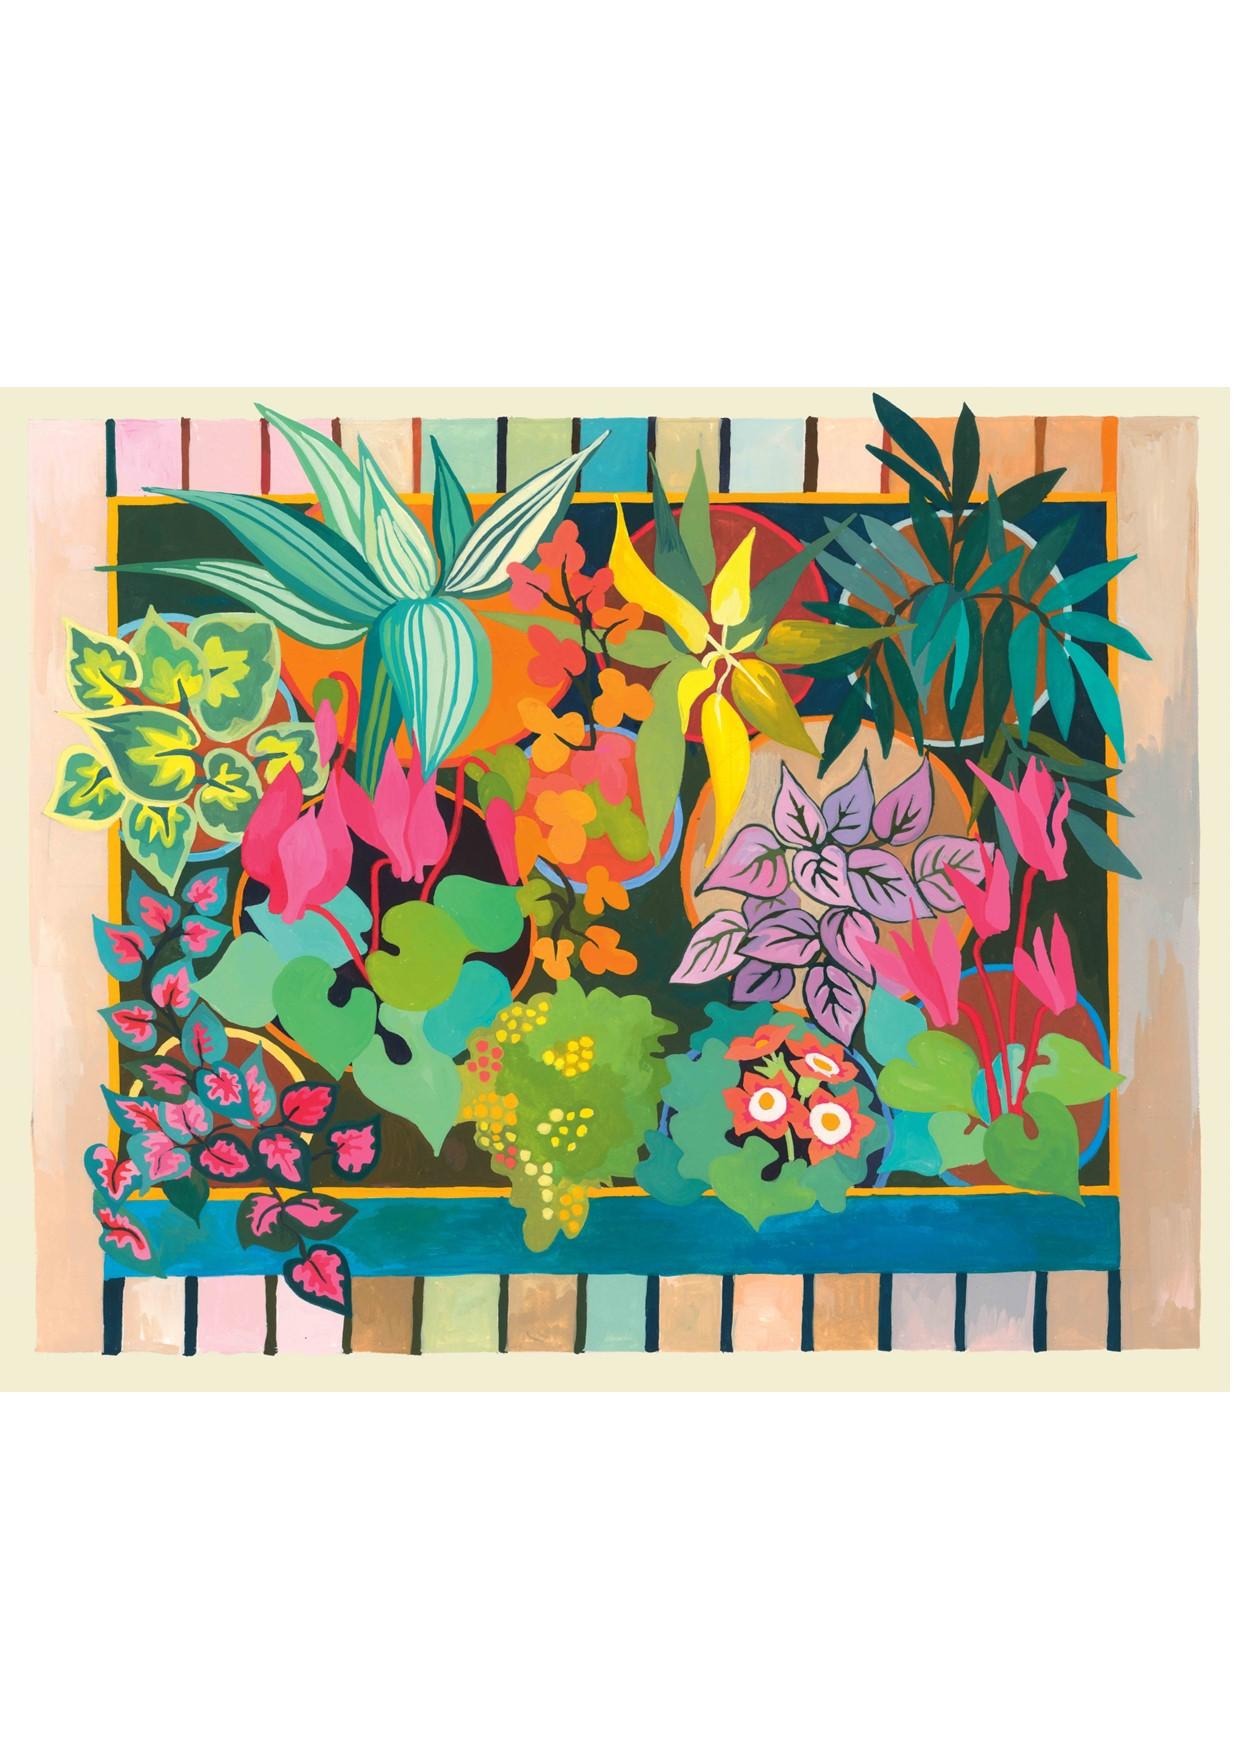 Painting of Florist Shop 1